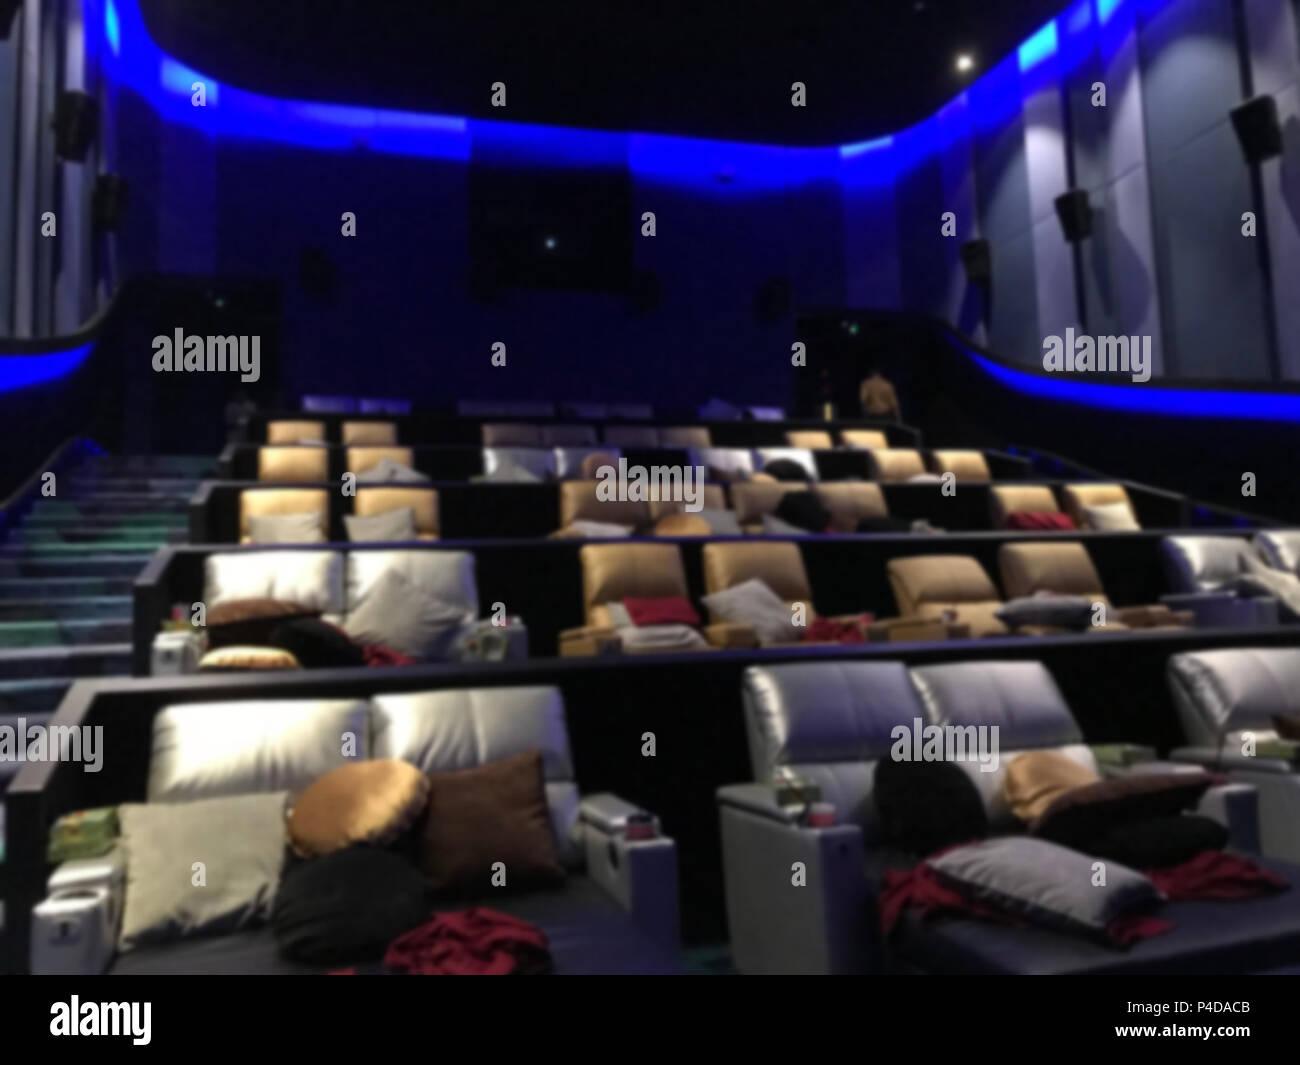 Luxus Kino Frankenthal